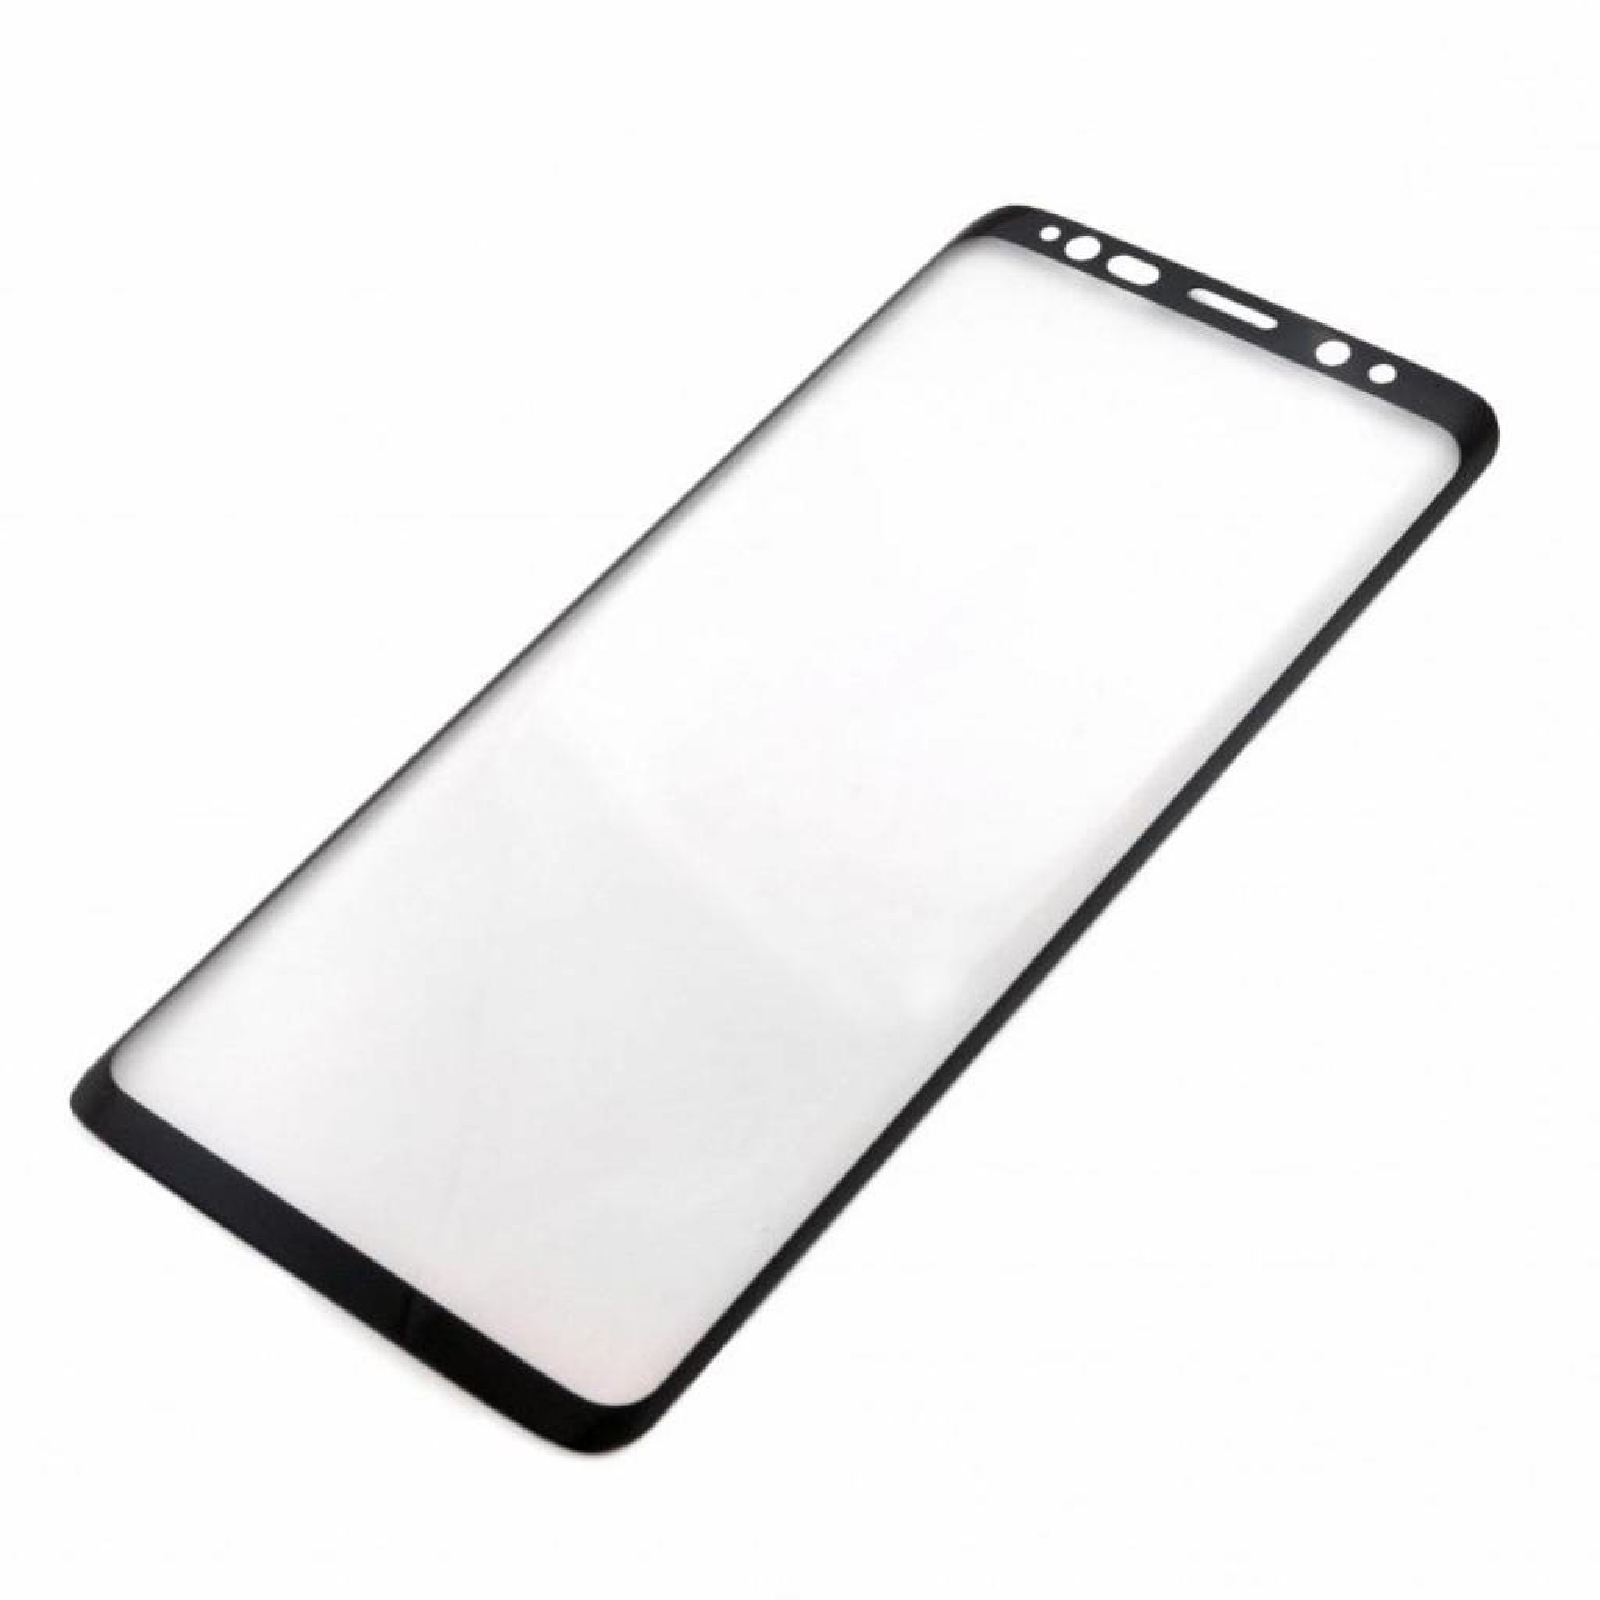 Стекло защитное iSG для Samsung Galaxy S9 3D Full Cover Black (SPG4430) изображение 2